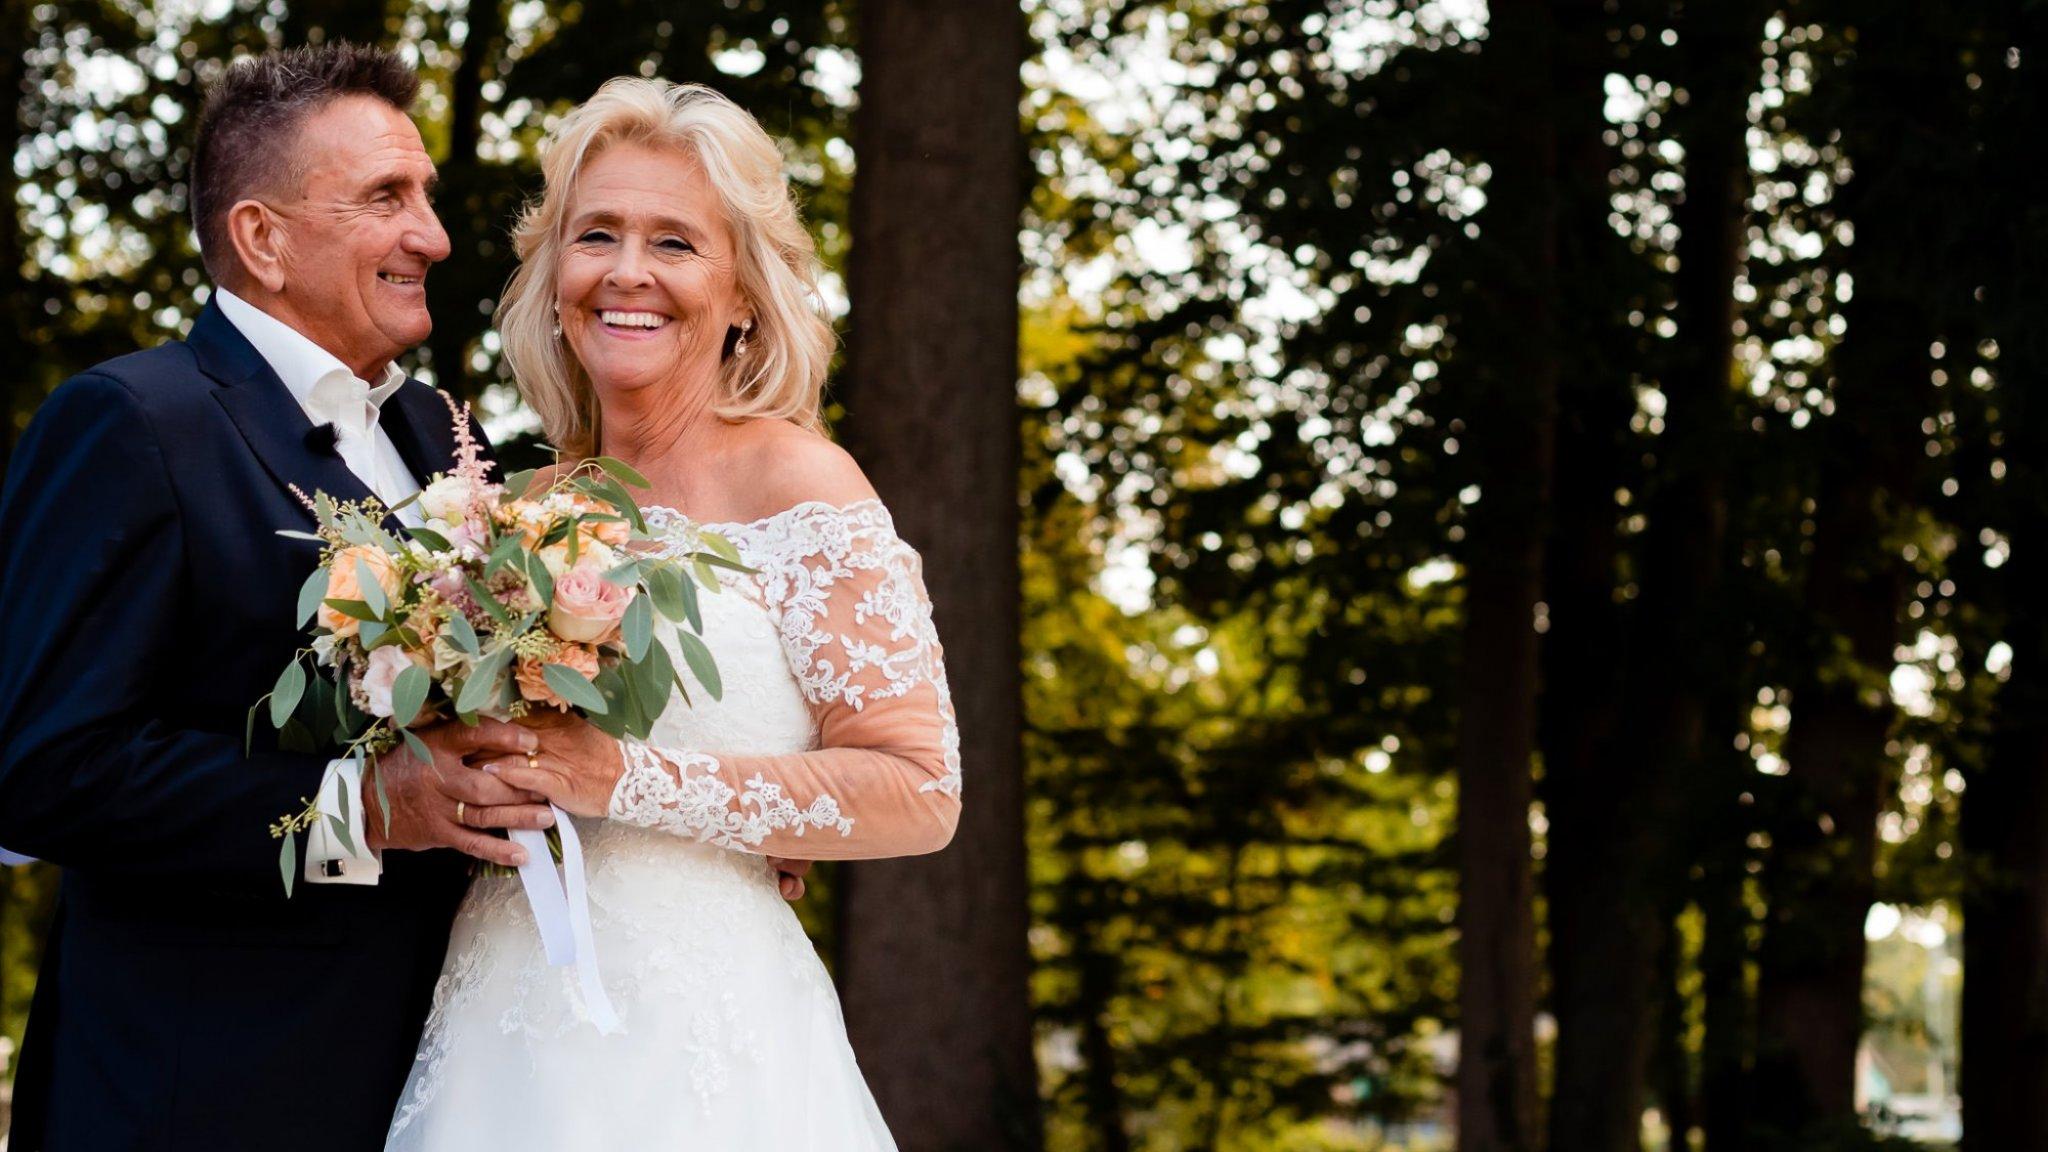 Freddy en Sylvia uit MAFS gaan tóch scheiden - RTL Boulevard